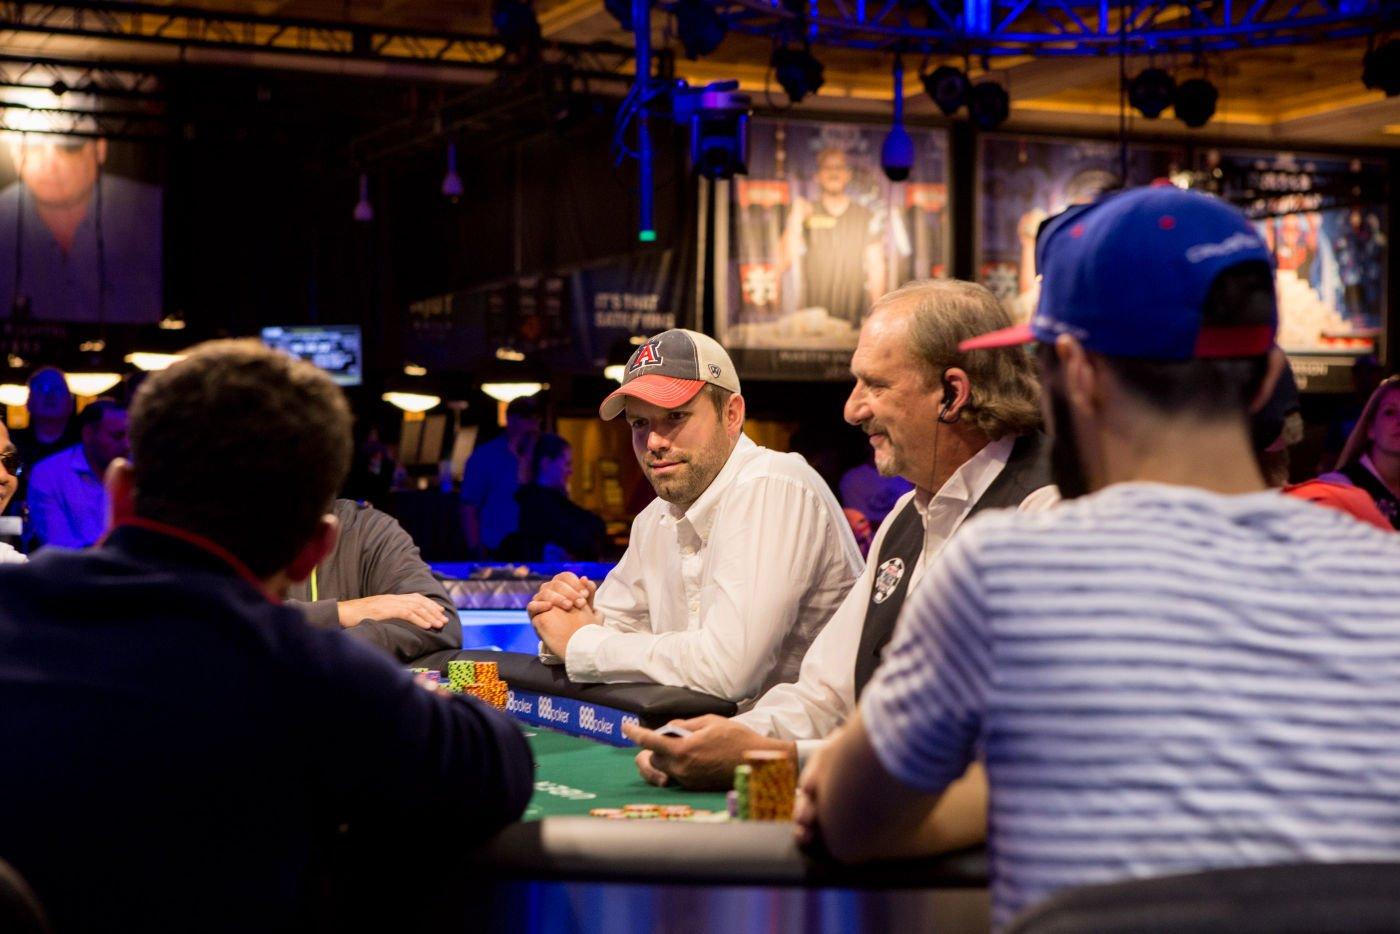 Casino poker tournaments arizona blackjack tables for sale ireland